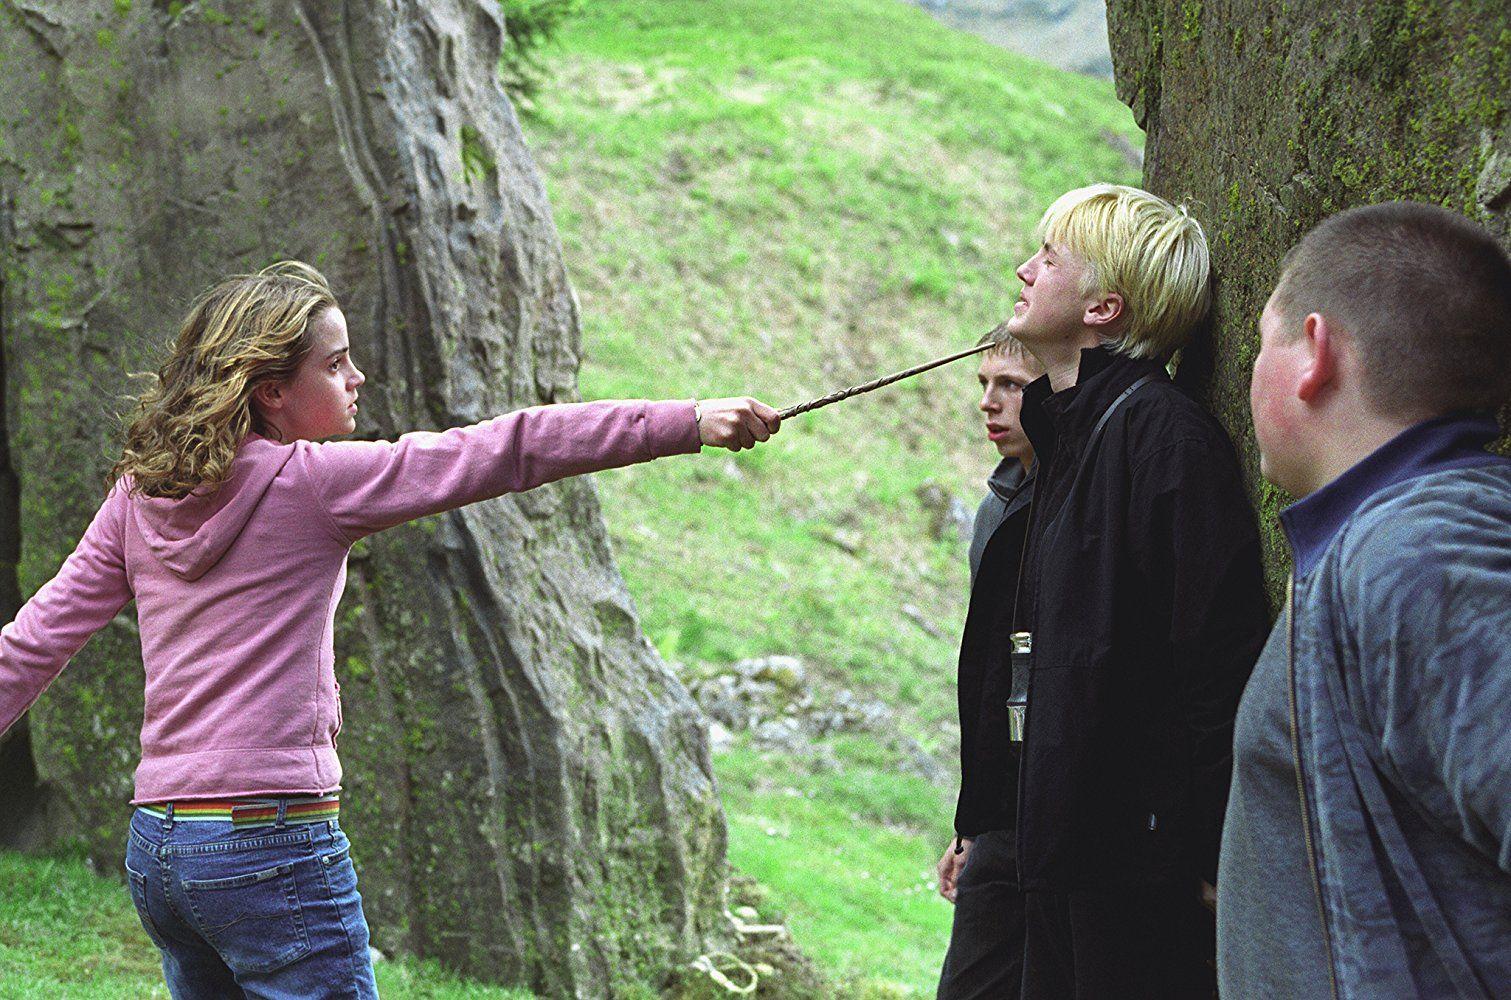 Harry Potter And The Prisoner Of Azkaban 2004 Photo Gallery Imdb Harry Potter Movies Harry Potter Scene Harry Potter Set